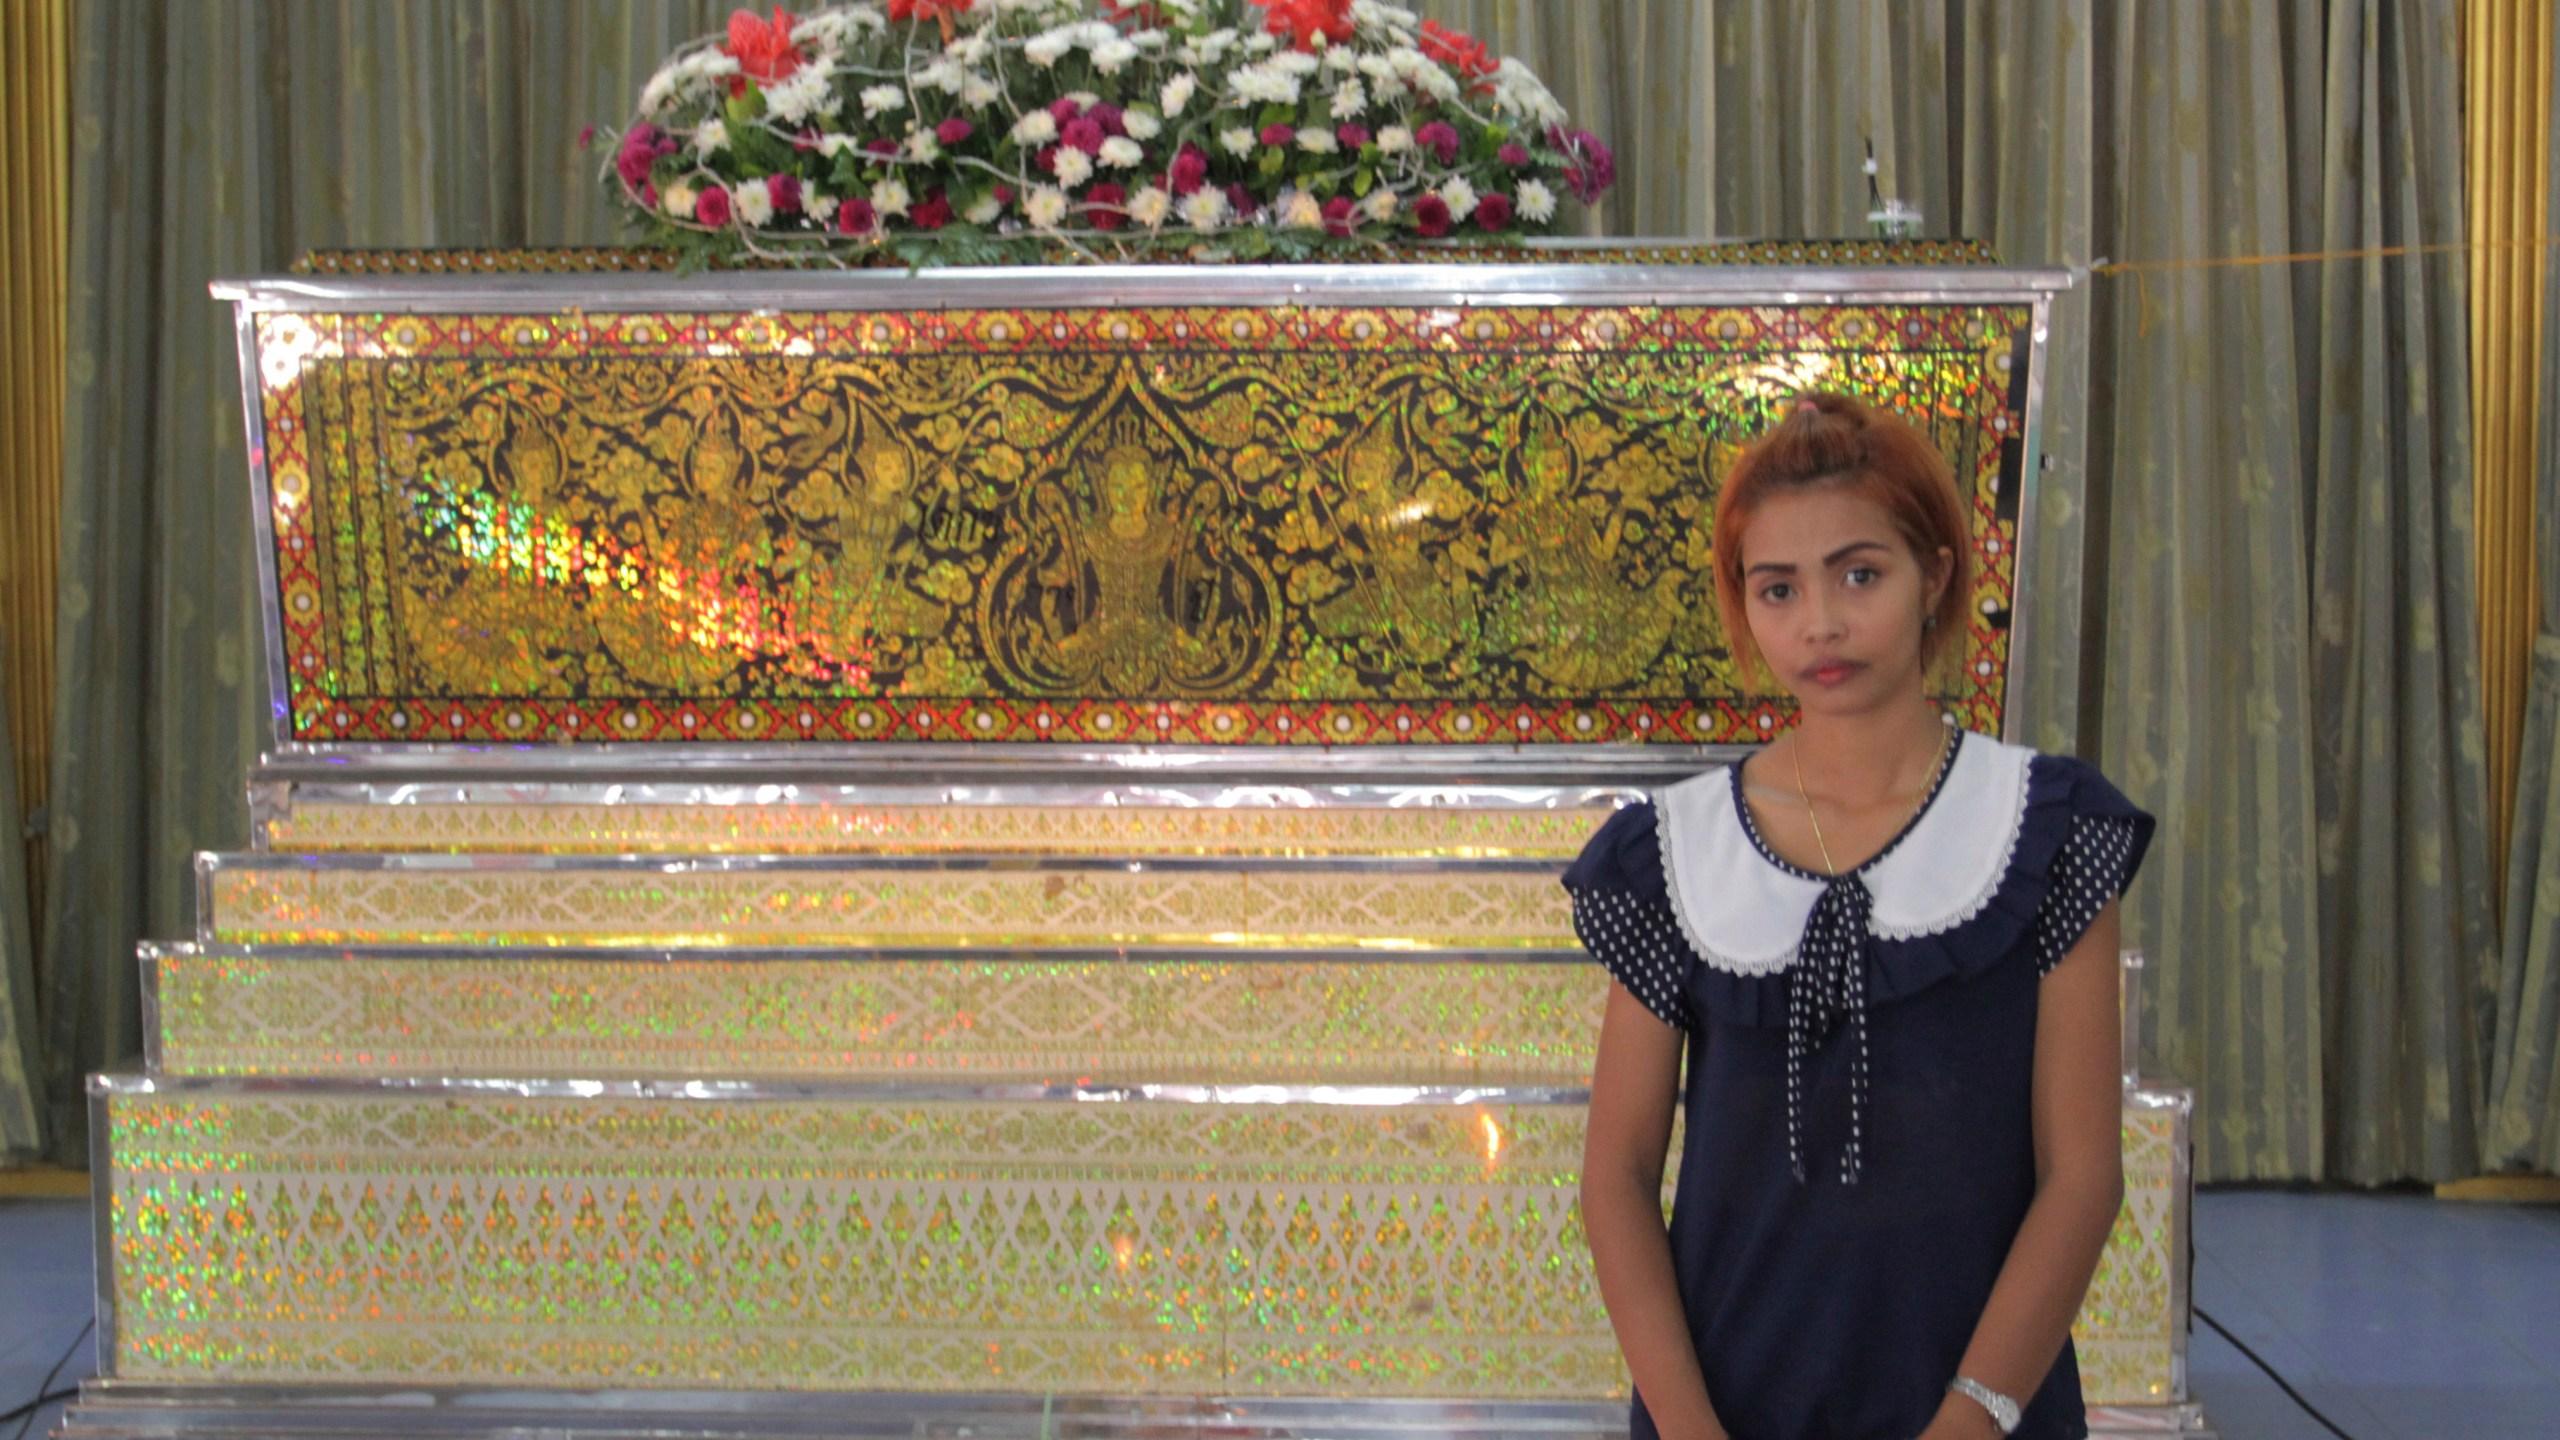 Thailand Facebook Killings Photo by AP Photo_322248